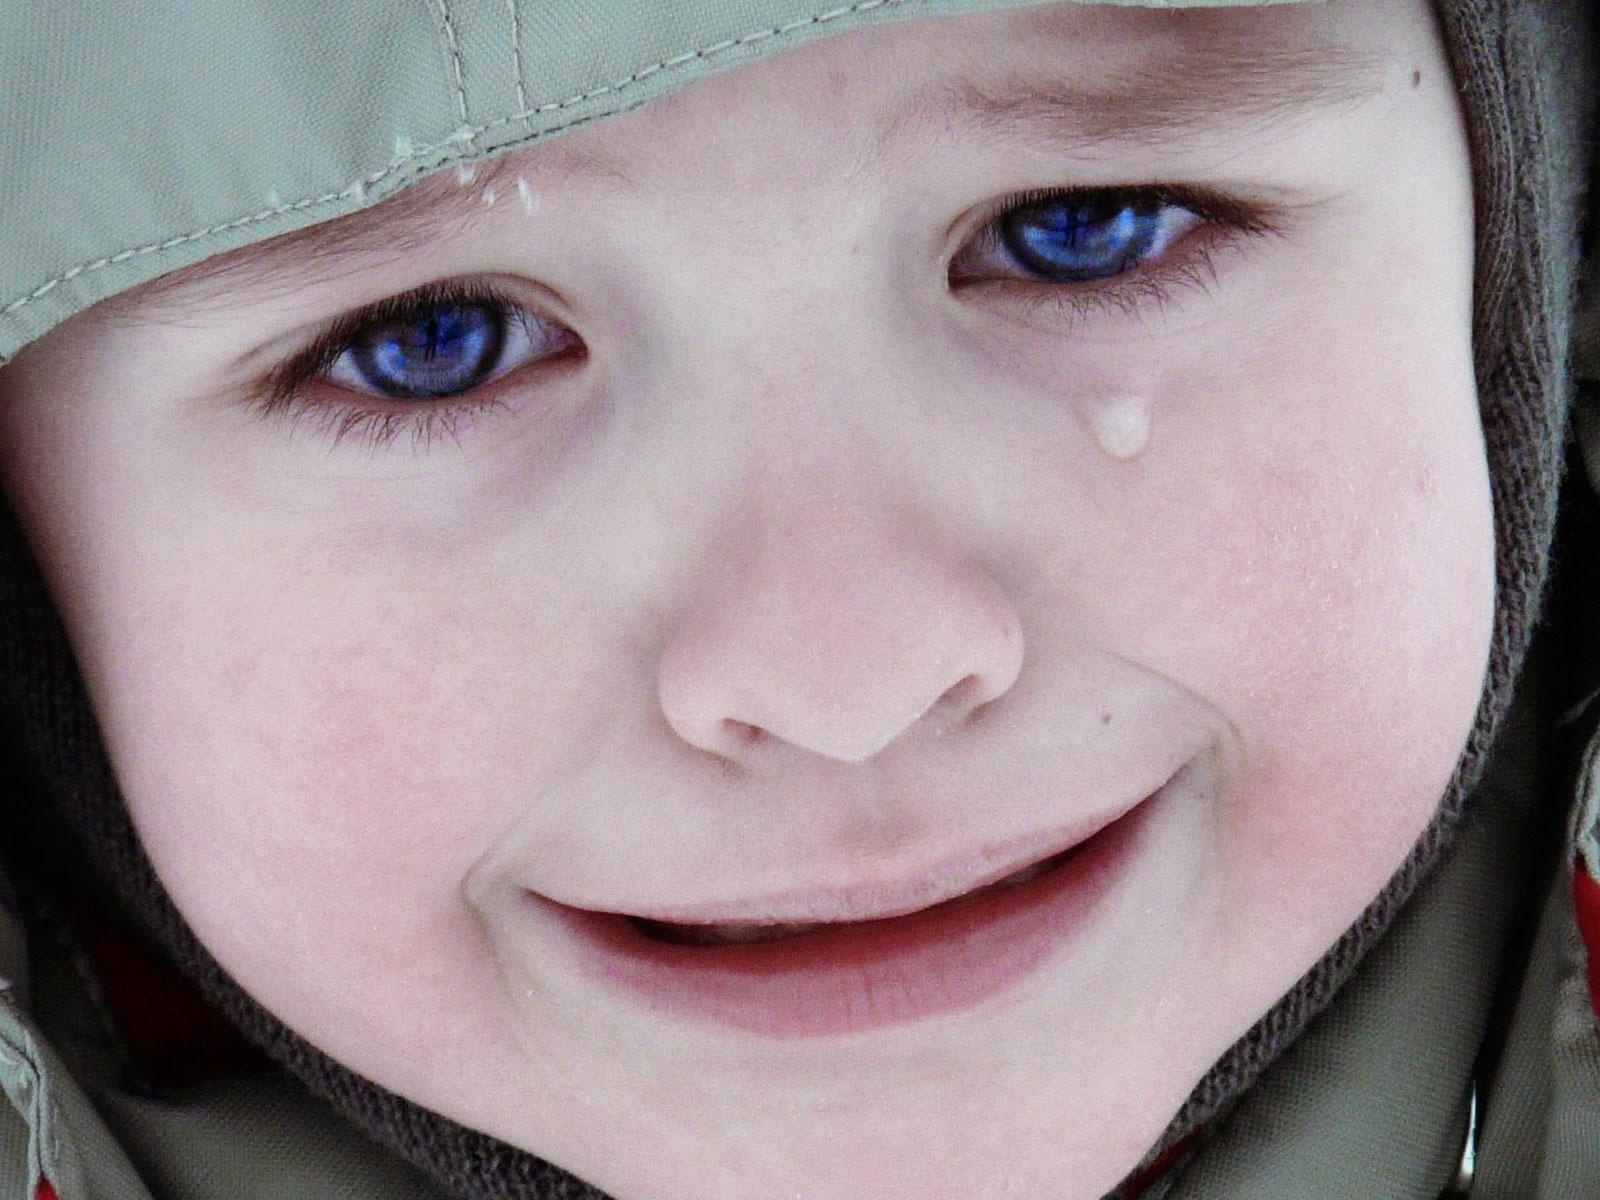 Cute sad baby face